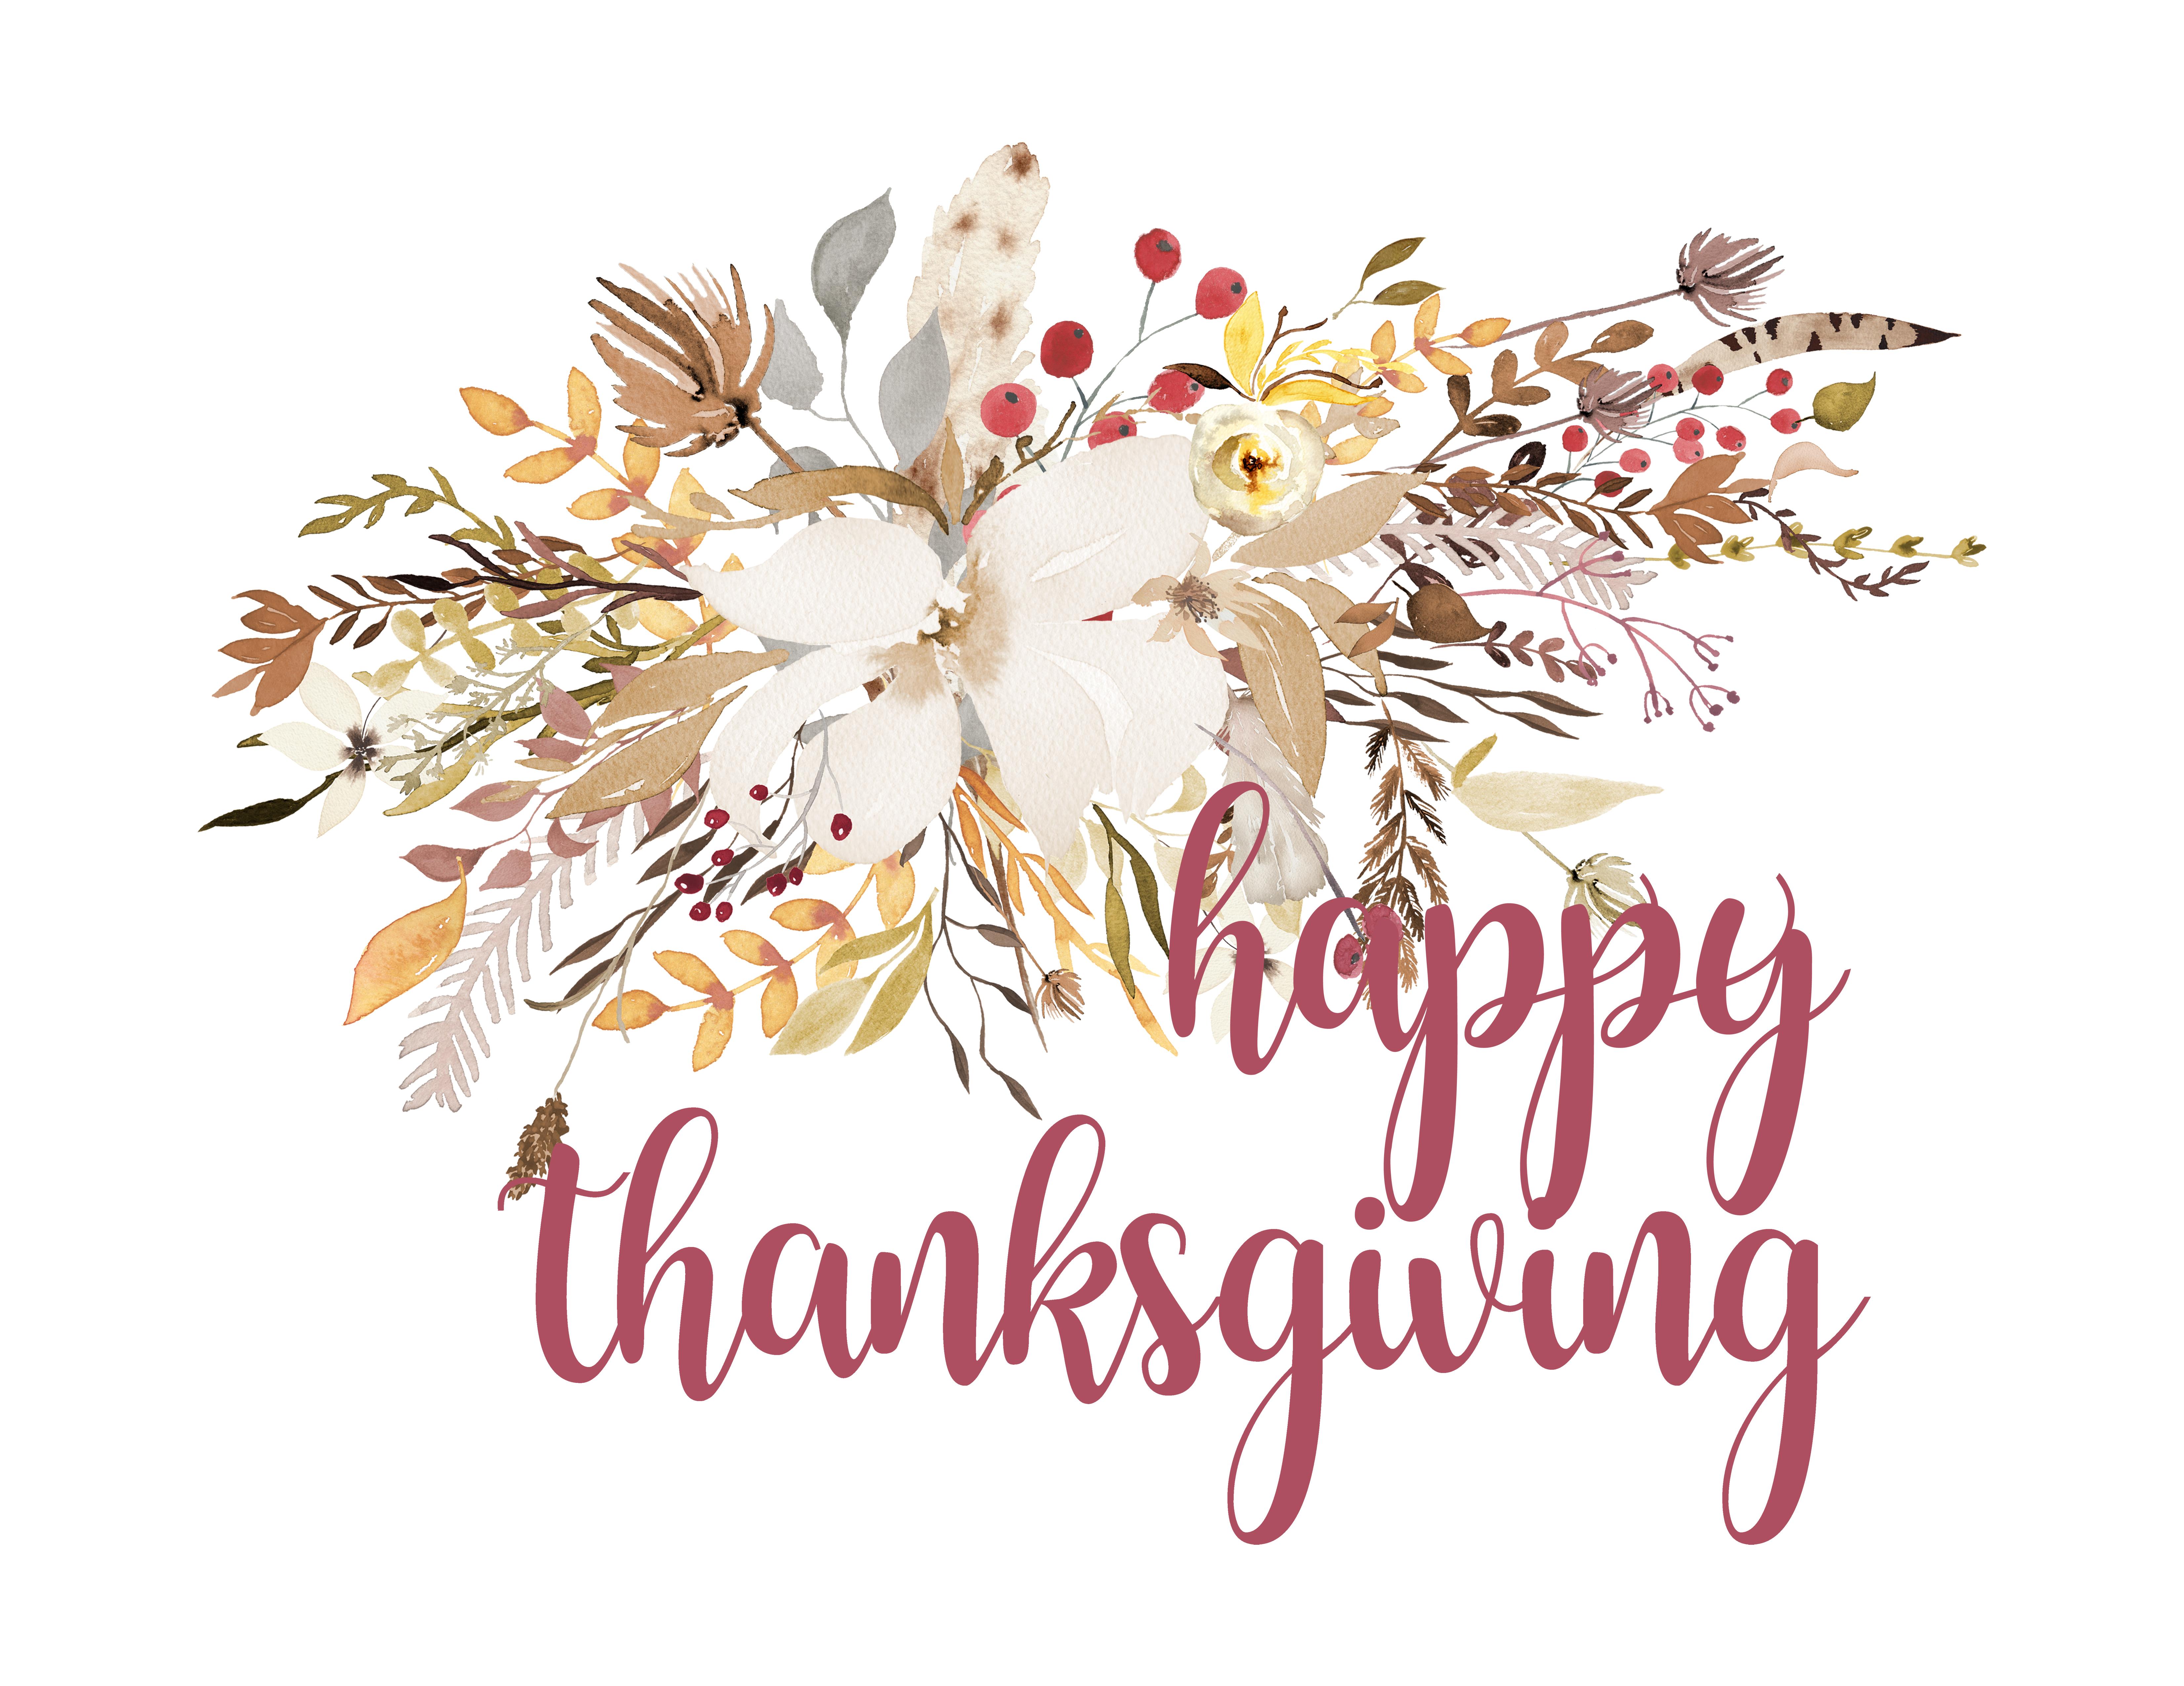 Fall And Thanksgiving Printables - Free Printable Thanksgiving Graphics